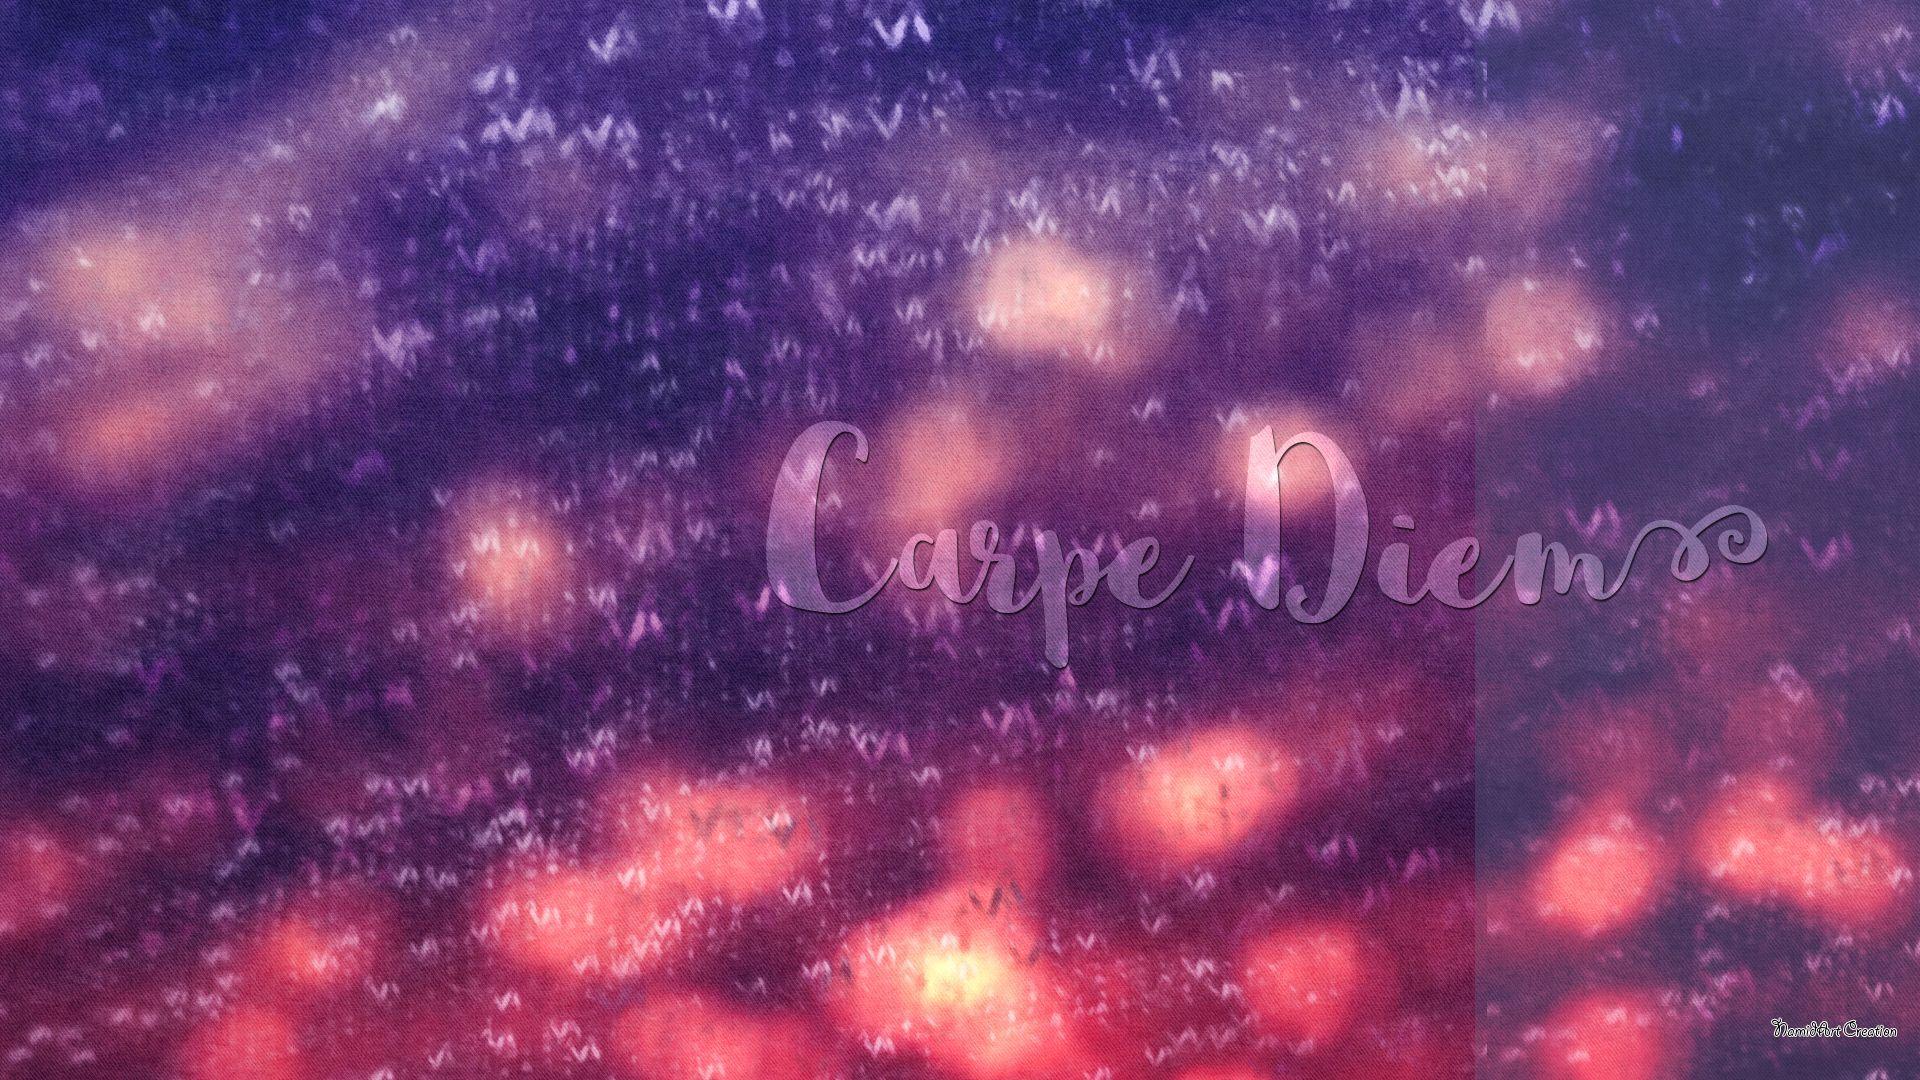 Carpe Diem good background